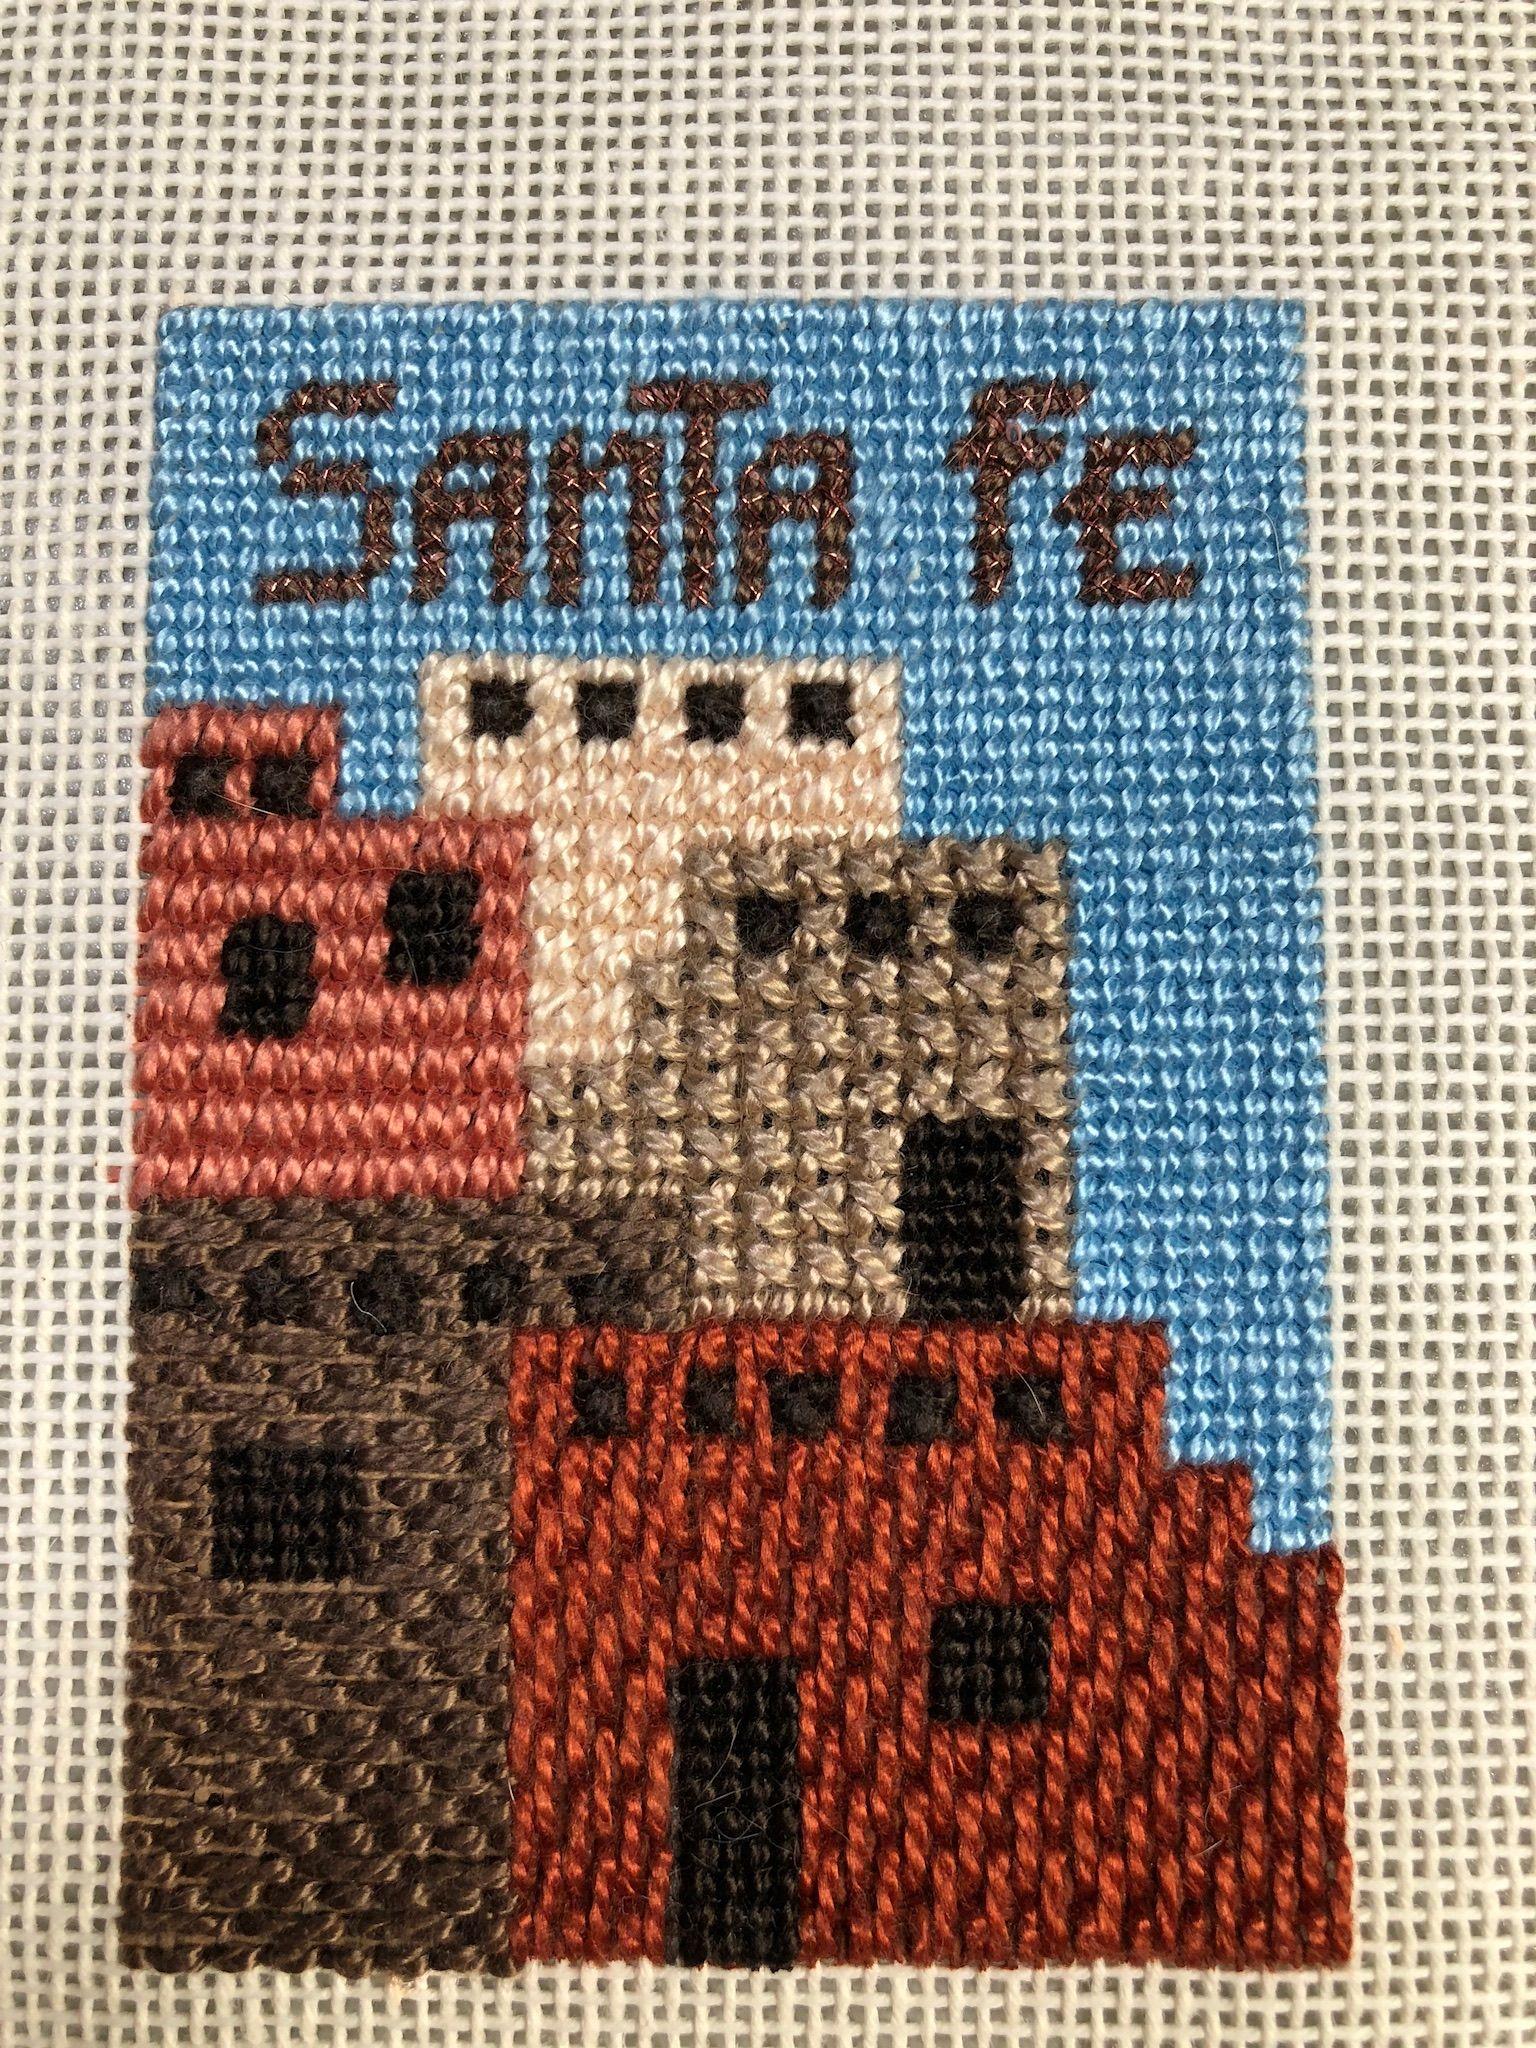 Canvas Santa Fe >> Canvas From Santa Fe 1996 Vacation Stitched Summer 2014